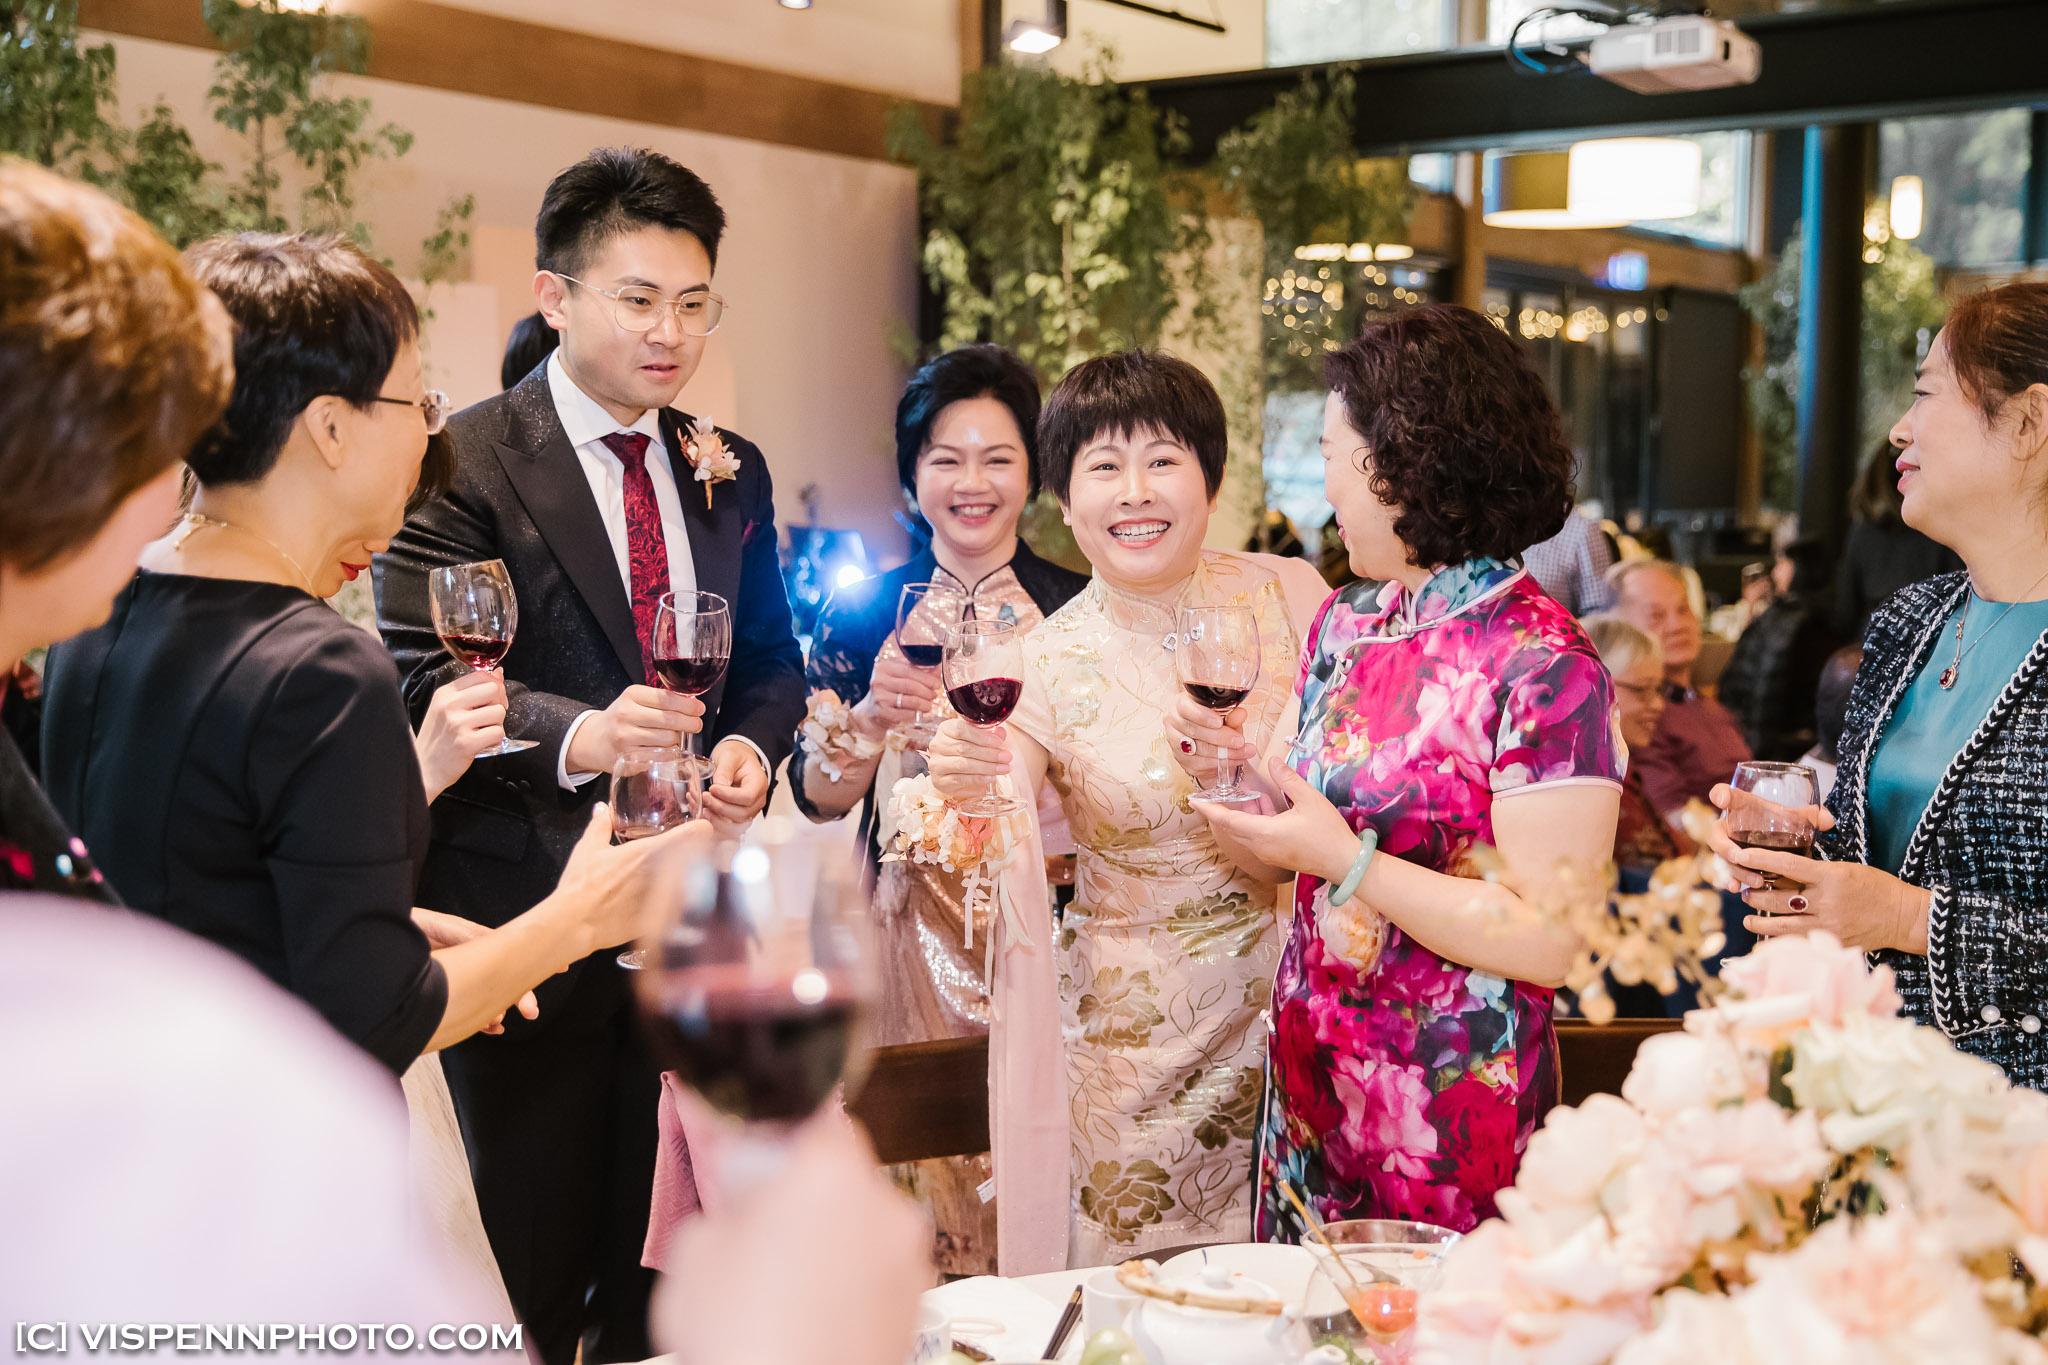 WEDDING DAY Photography Melbourne ElitaPB 10771 2P 1DX2 ZHPENN